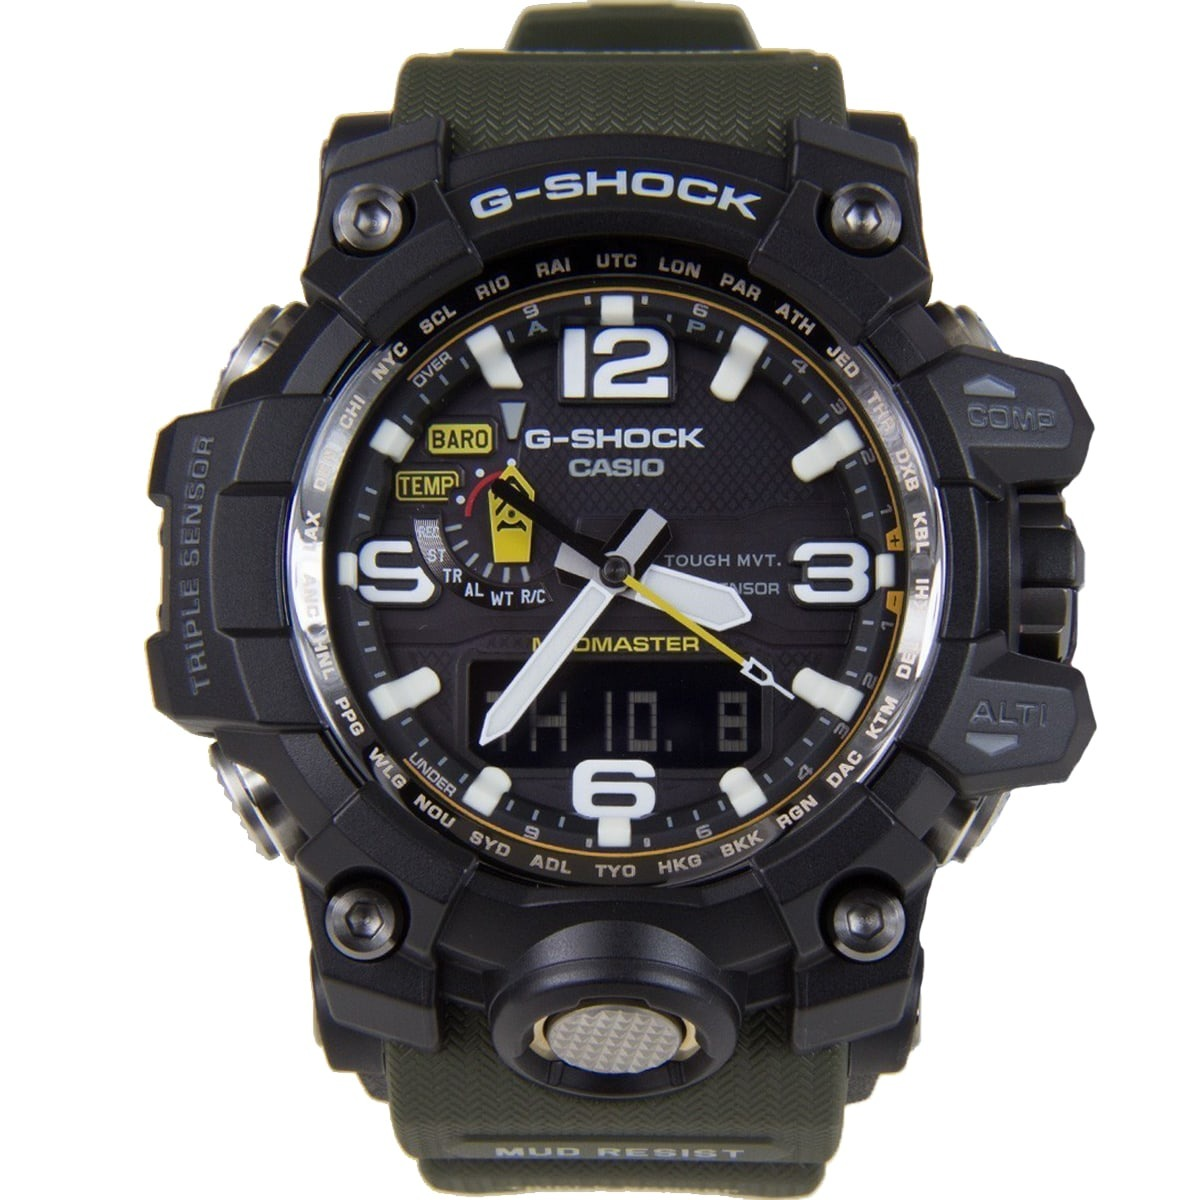 6d31567969a Relógio Casio G-shock Mudmaster Masculino Gwg-1000-1a3dr - R  4.199 ...